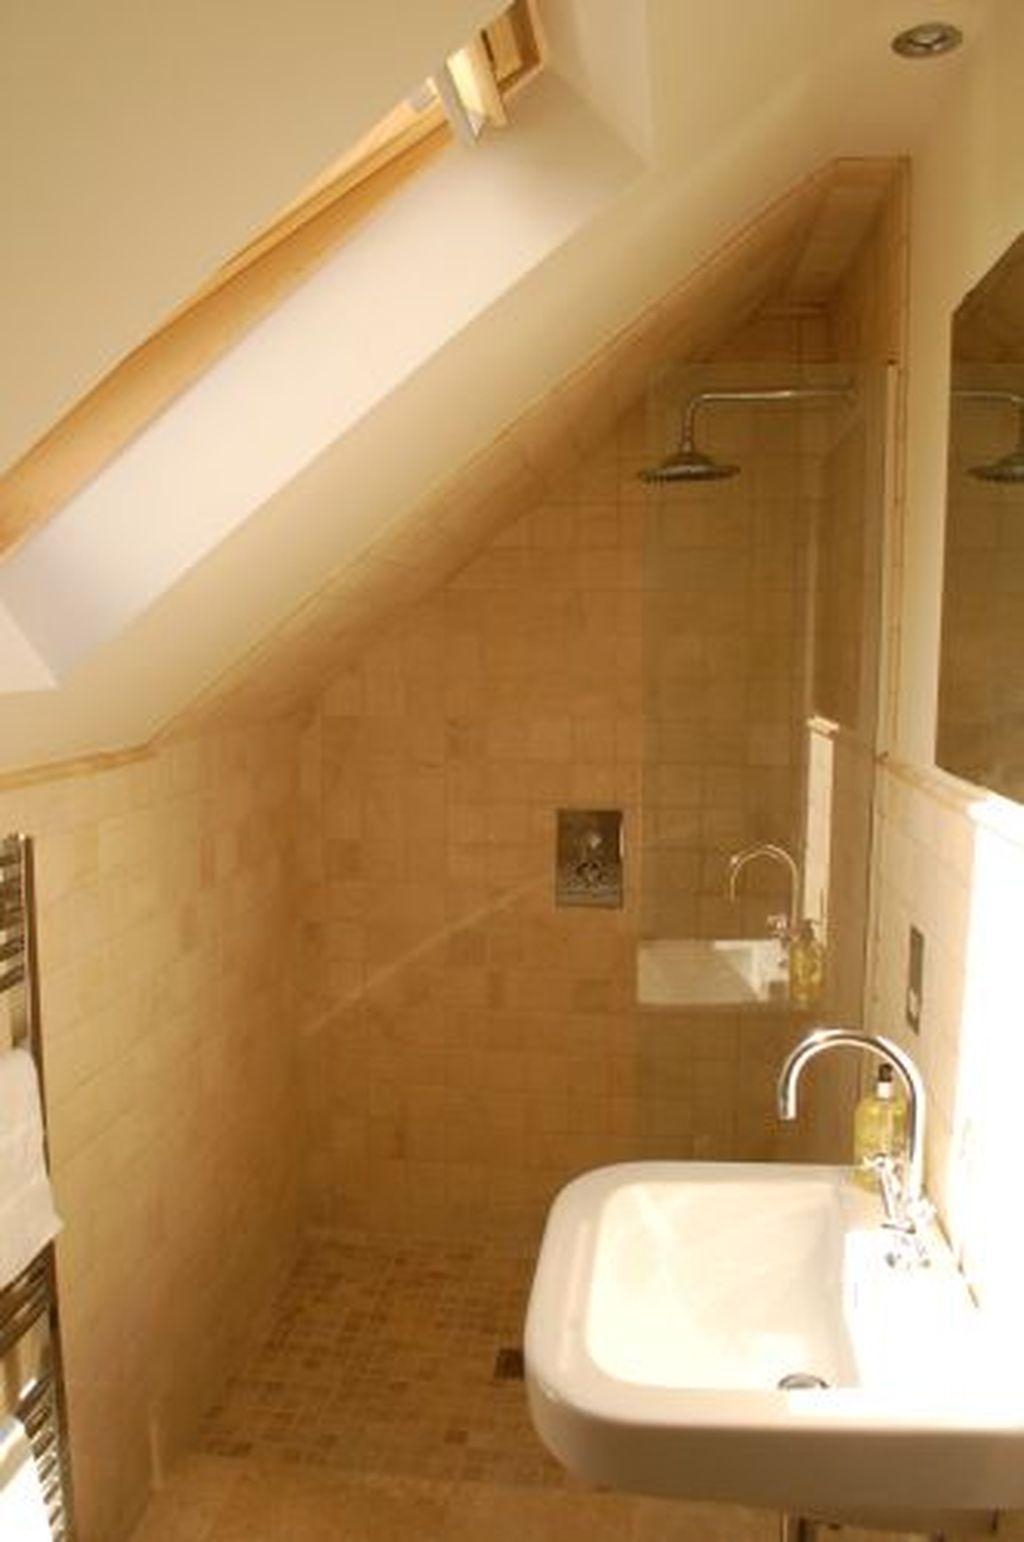 35 Creative Small Attic Bathroom Design Ideas Suitable Space Saving Decorating Ideas Home Decor Ideas And Tips Small Attic Bathroom Attic Rooms Attic Shower